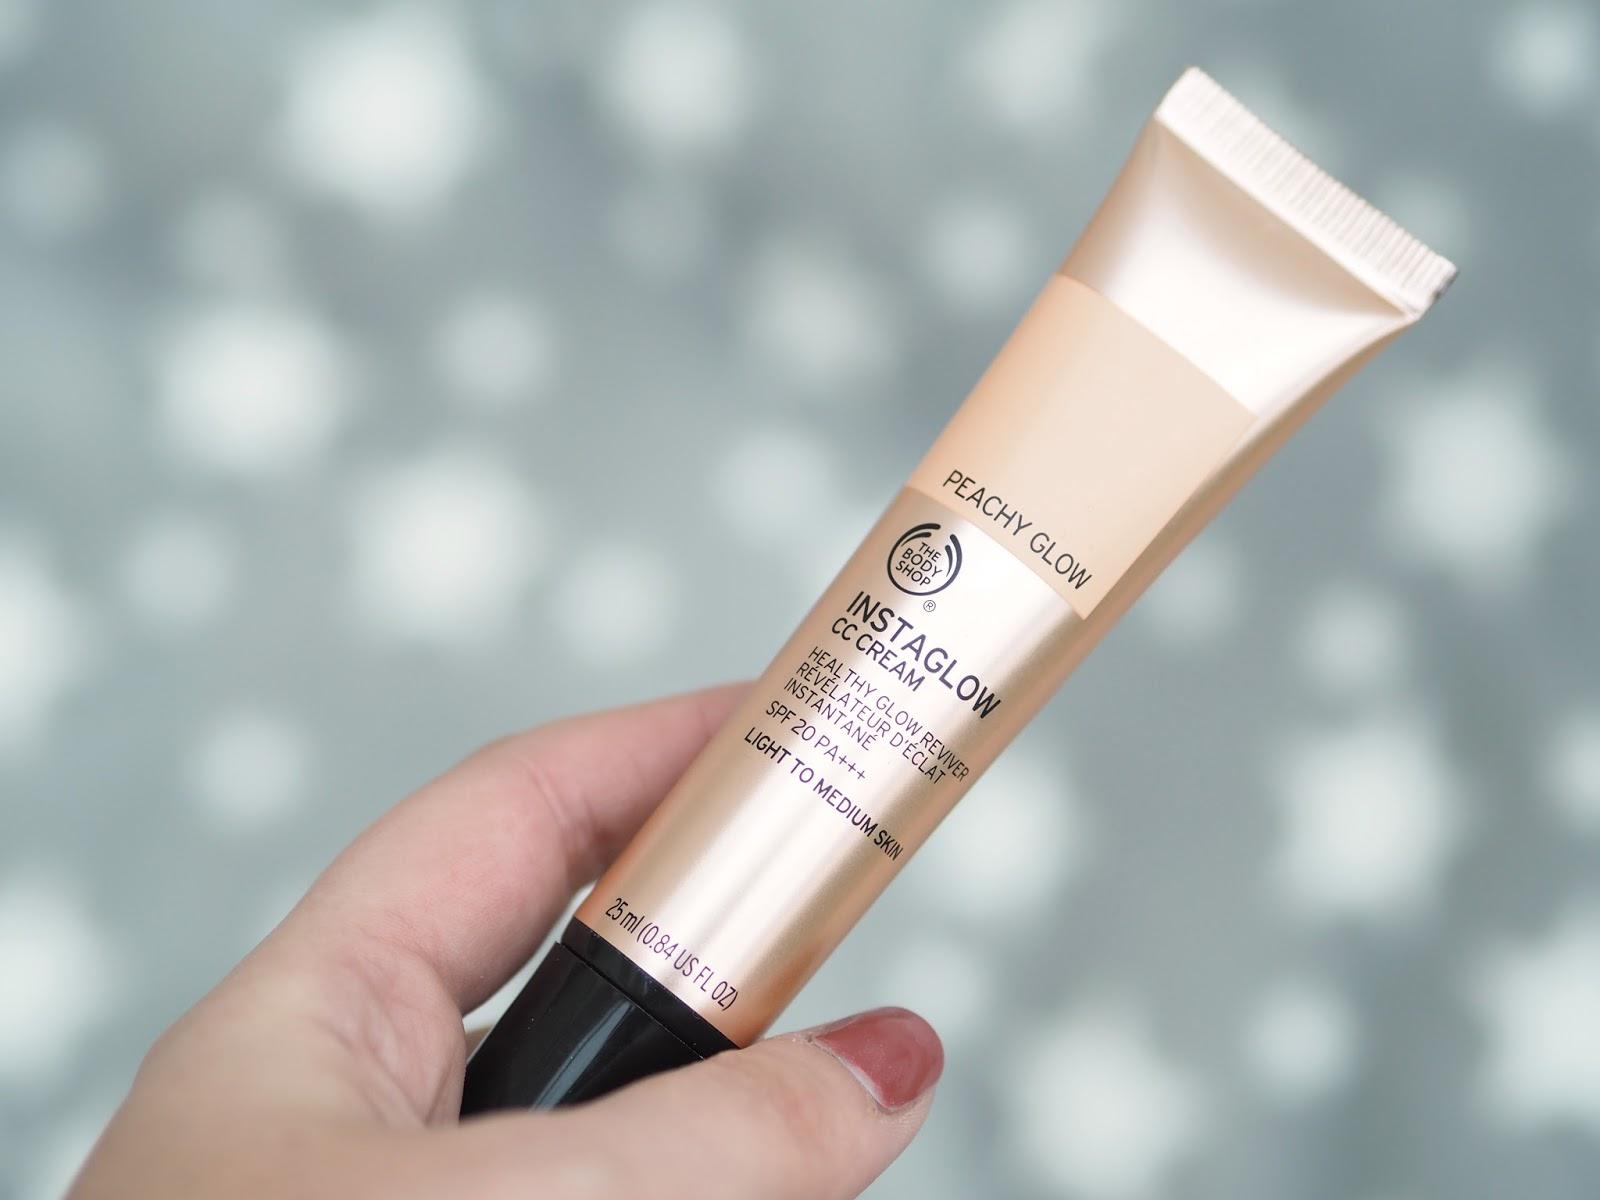 The Body Shop Instaglow Peachy Glow CC Cream